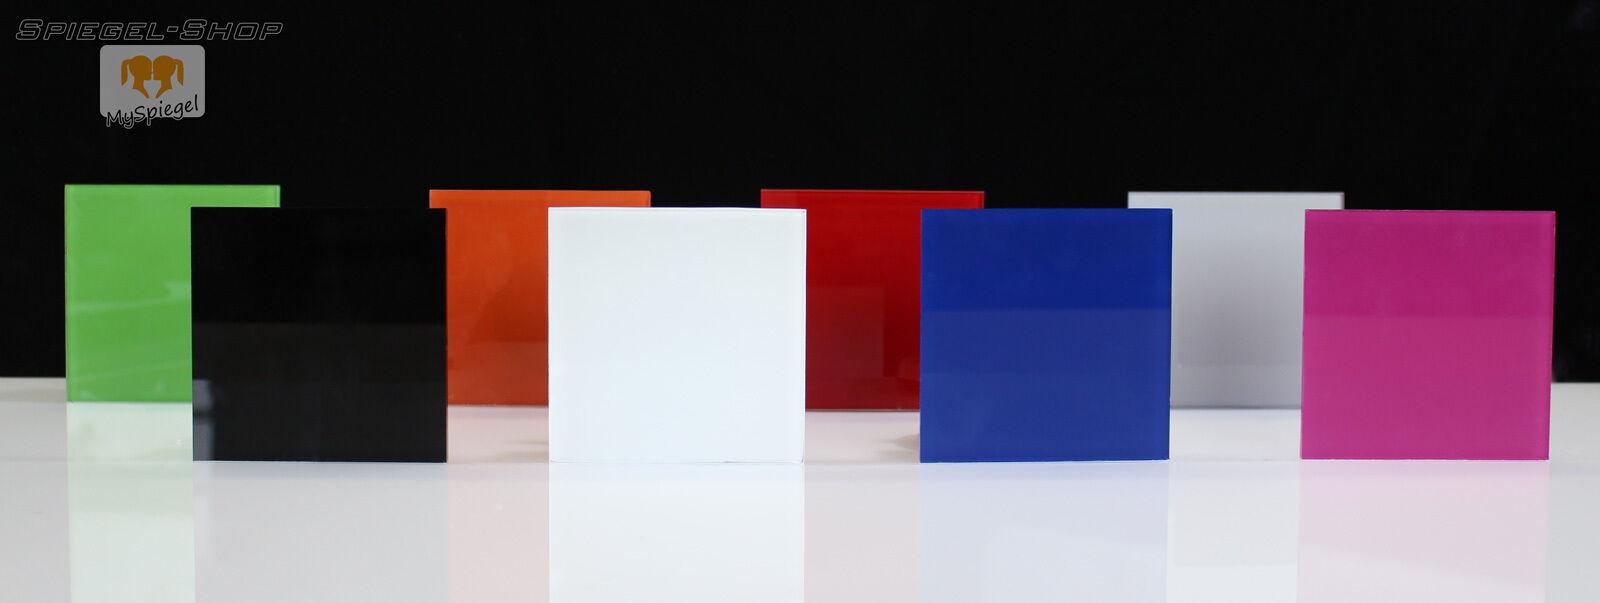 k chenr ckwand fliesenspiegel glas 4mm farbig lackiert f r. Black Bedroom Furniture Sets. Home Design Ideas